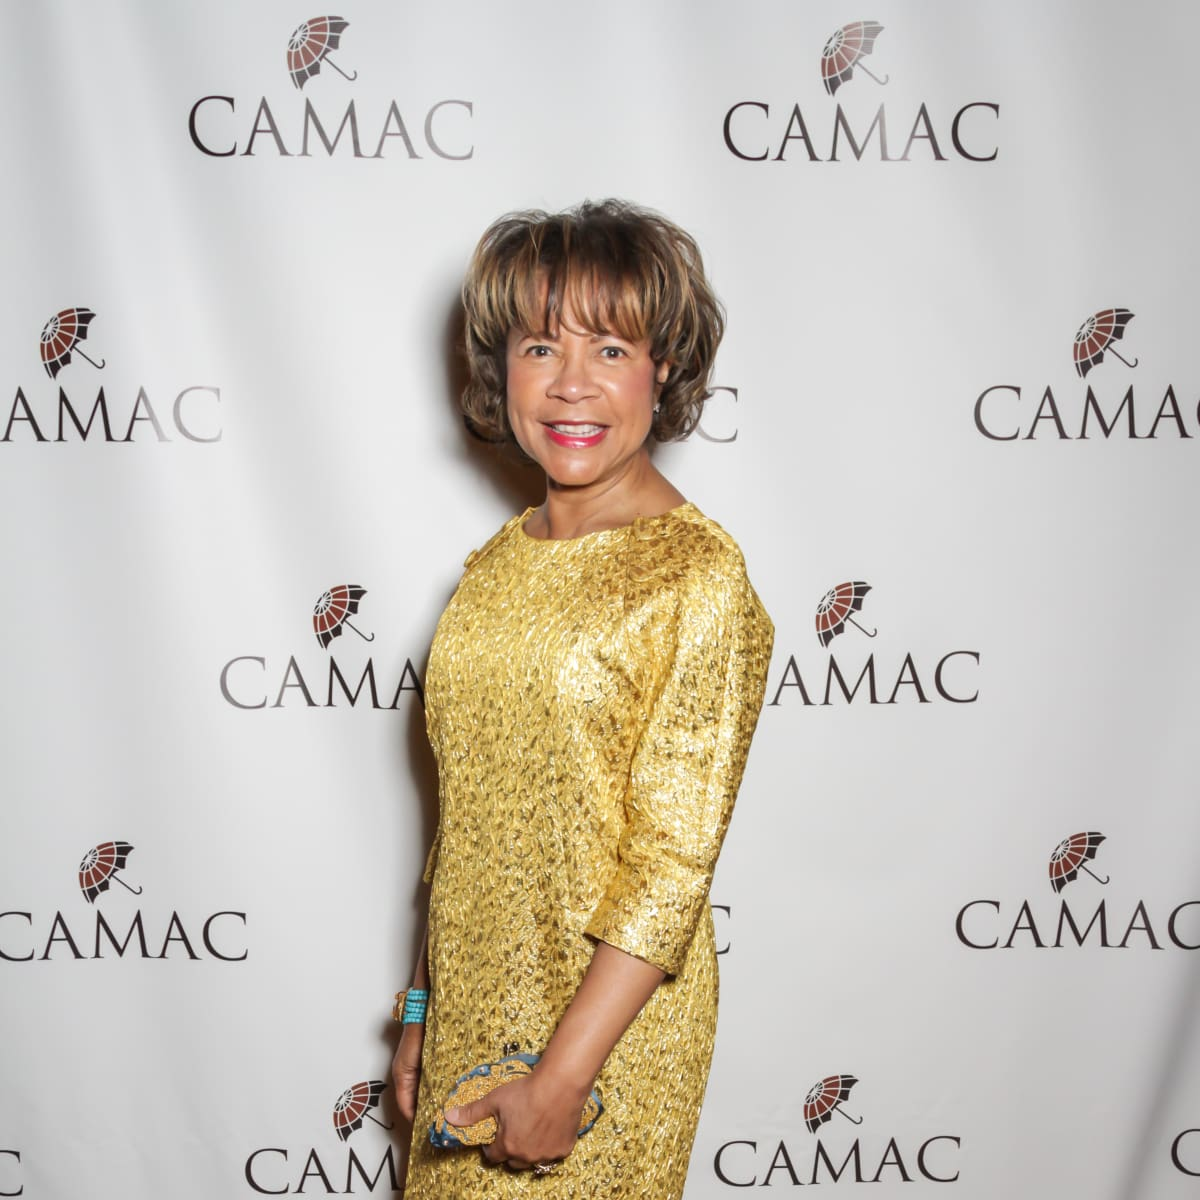 CAMAC 30th anny gala, Jan. 2016, Merele Yarborough